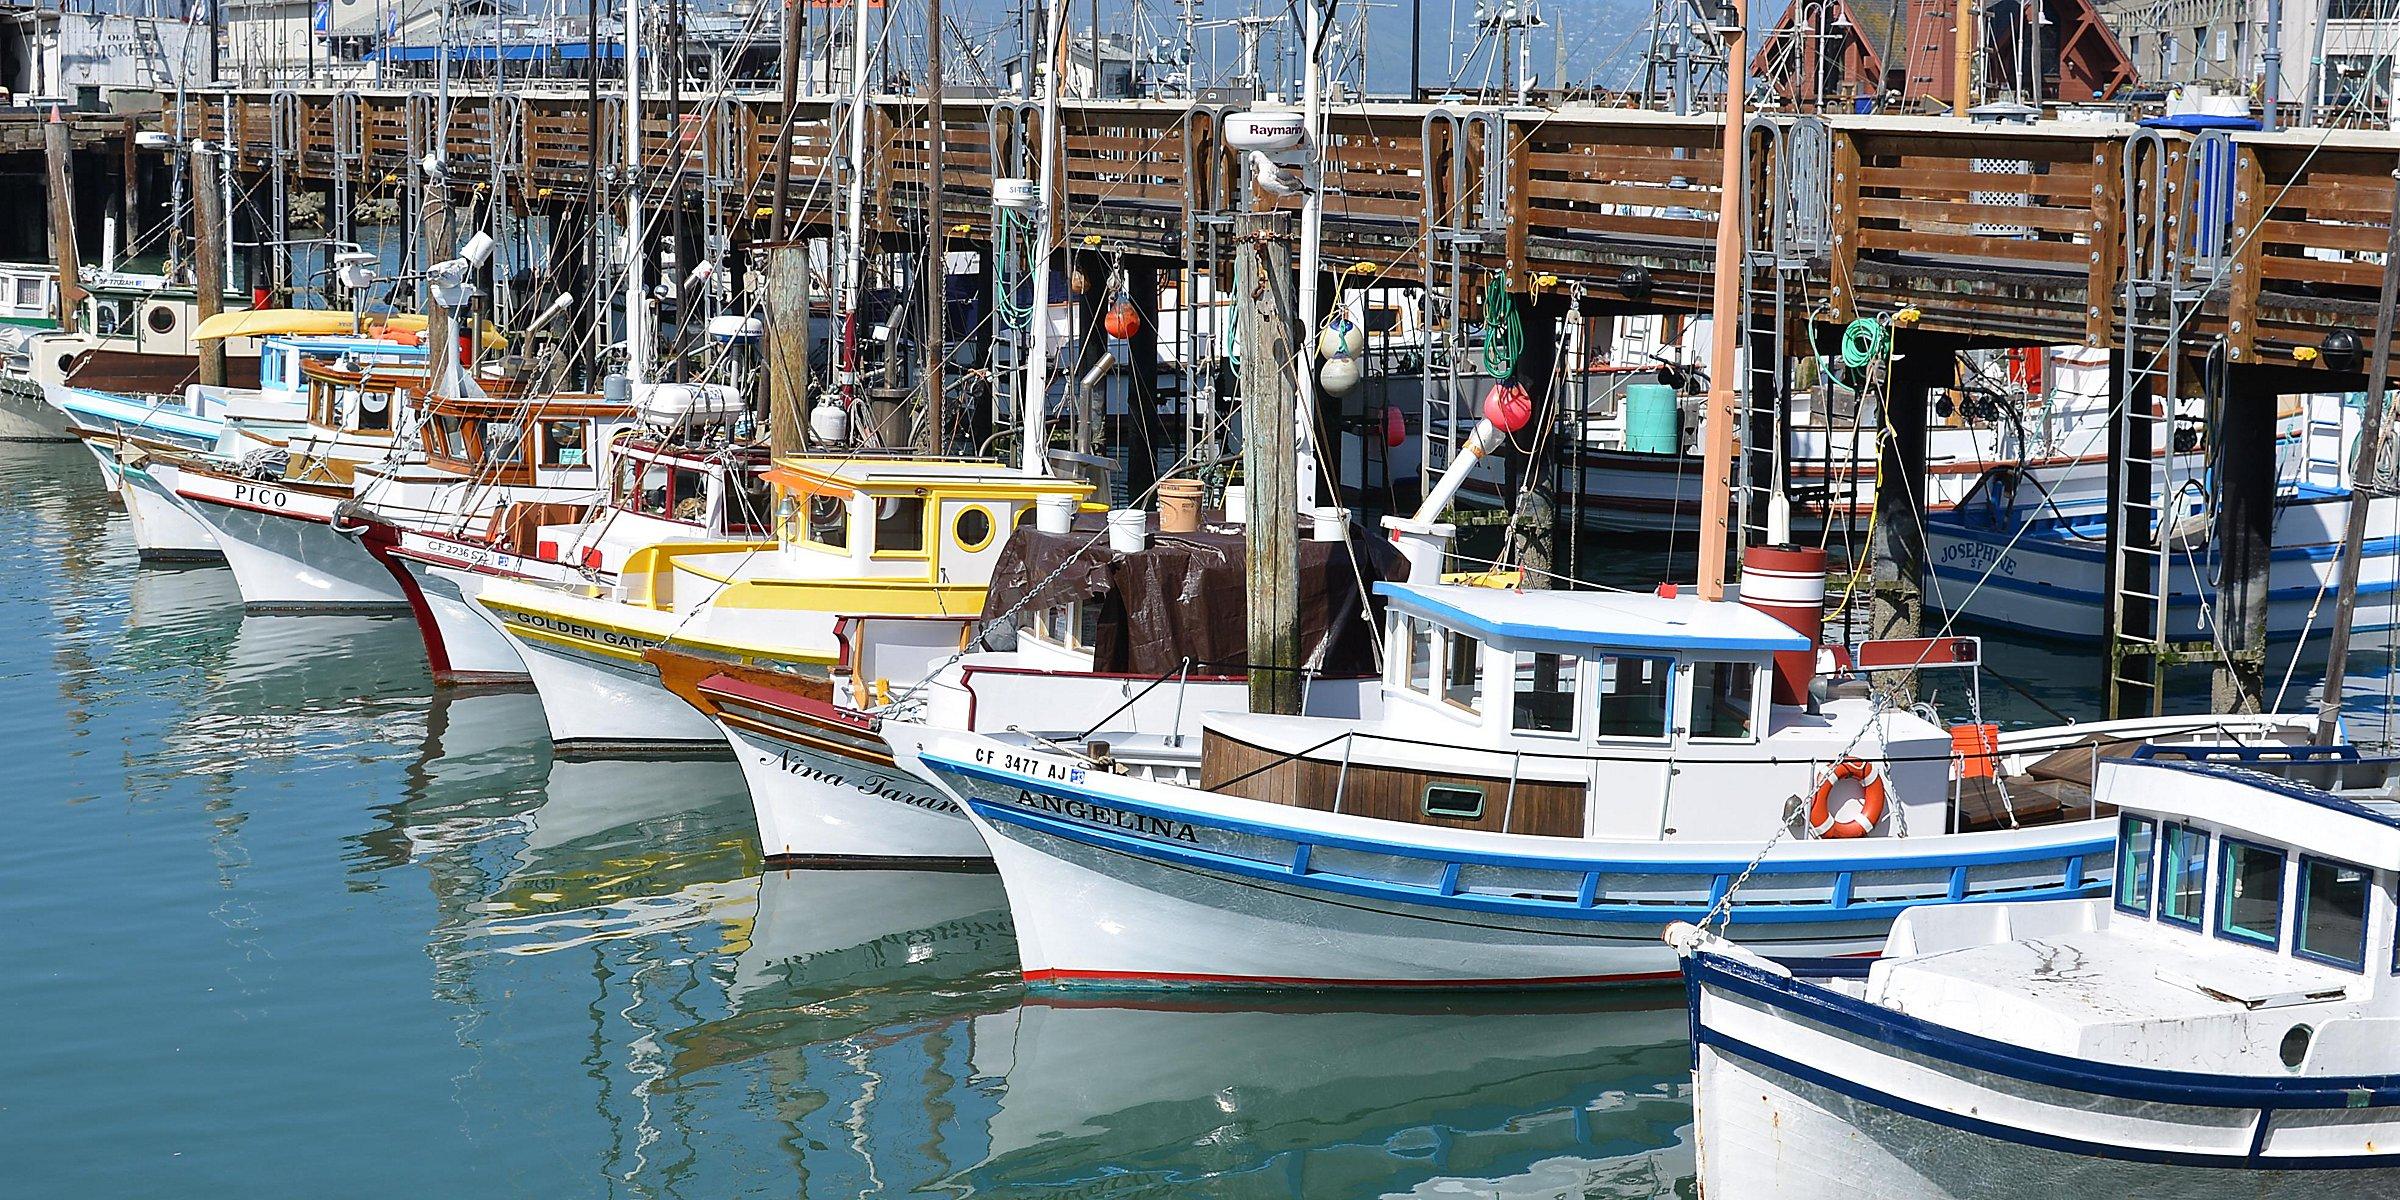 Fisherman S Wharf Hotels Near Pier 39 Holiday Inn San